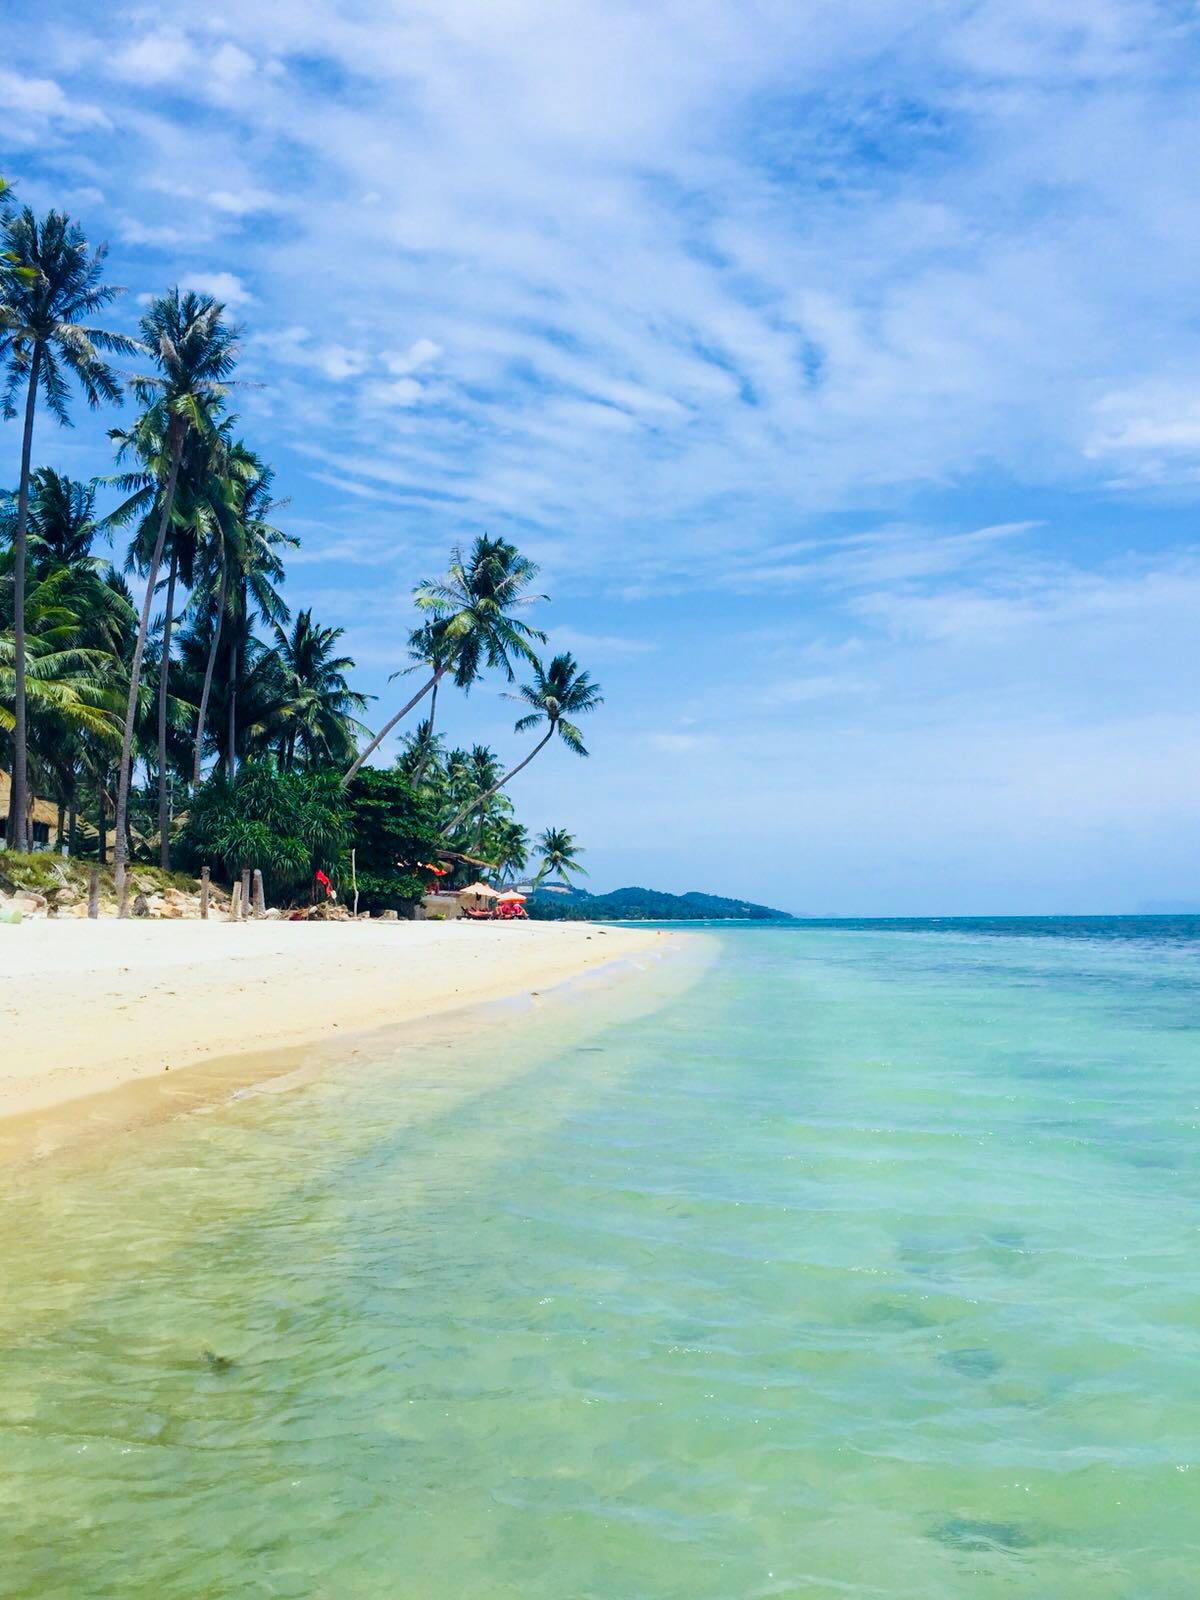 bamboo island, bamboo island phuket, bamboo island phi phi, bamboo island thailand, bamboo thailand, bamboo island krabi, bamboo island phuket, bamboo island phi phi, phi phi bamboo island